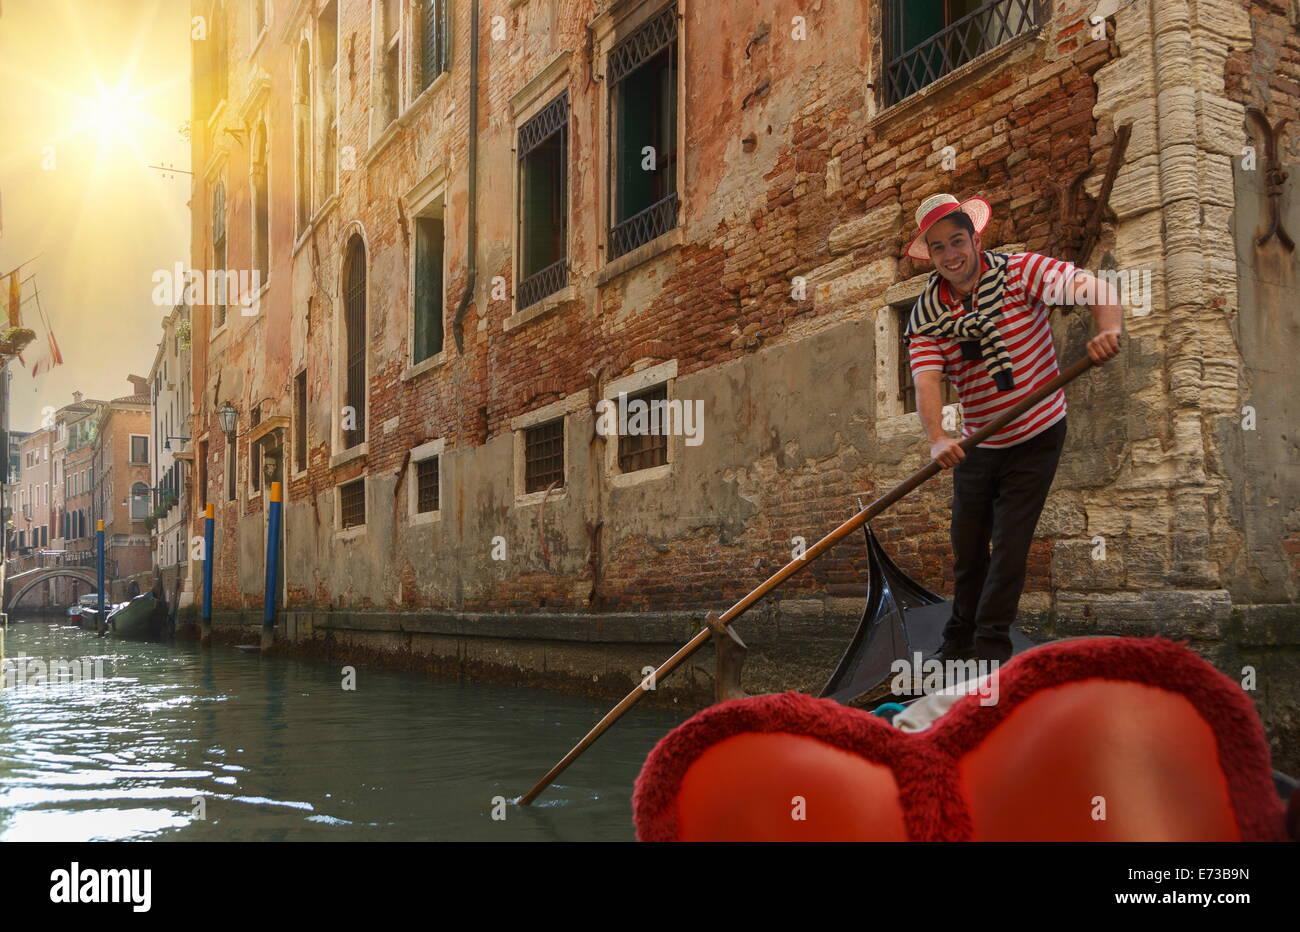 Gondolier, Venice, UNESCO World Heritage Site, Veneto, Italy, Europe - Stock Image